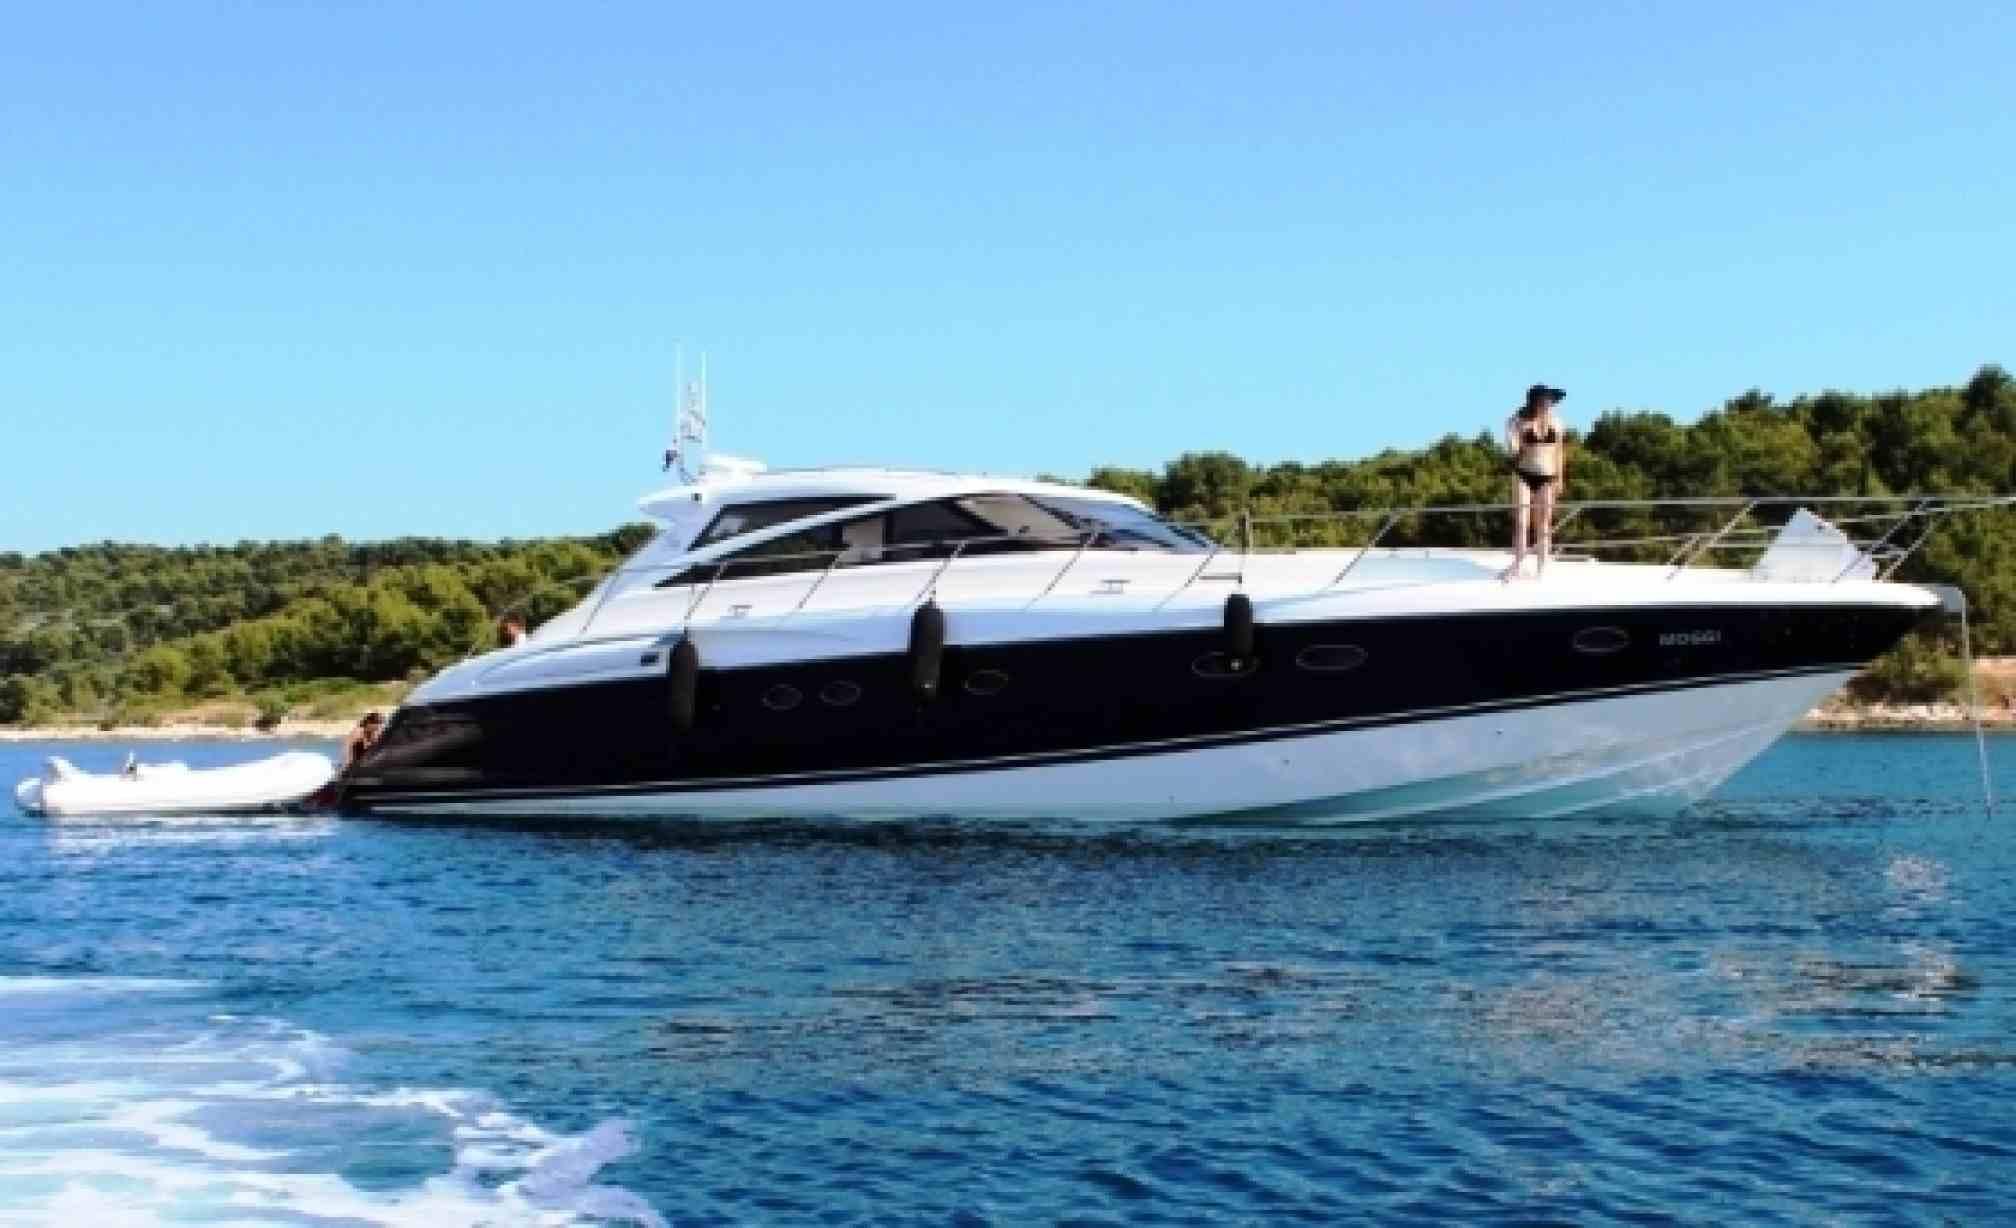 Princess V58 charter yacht sailing